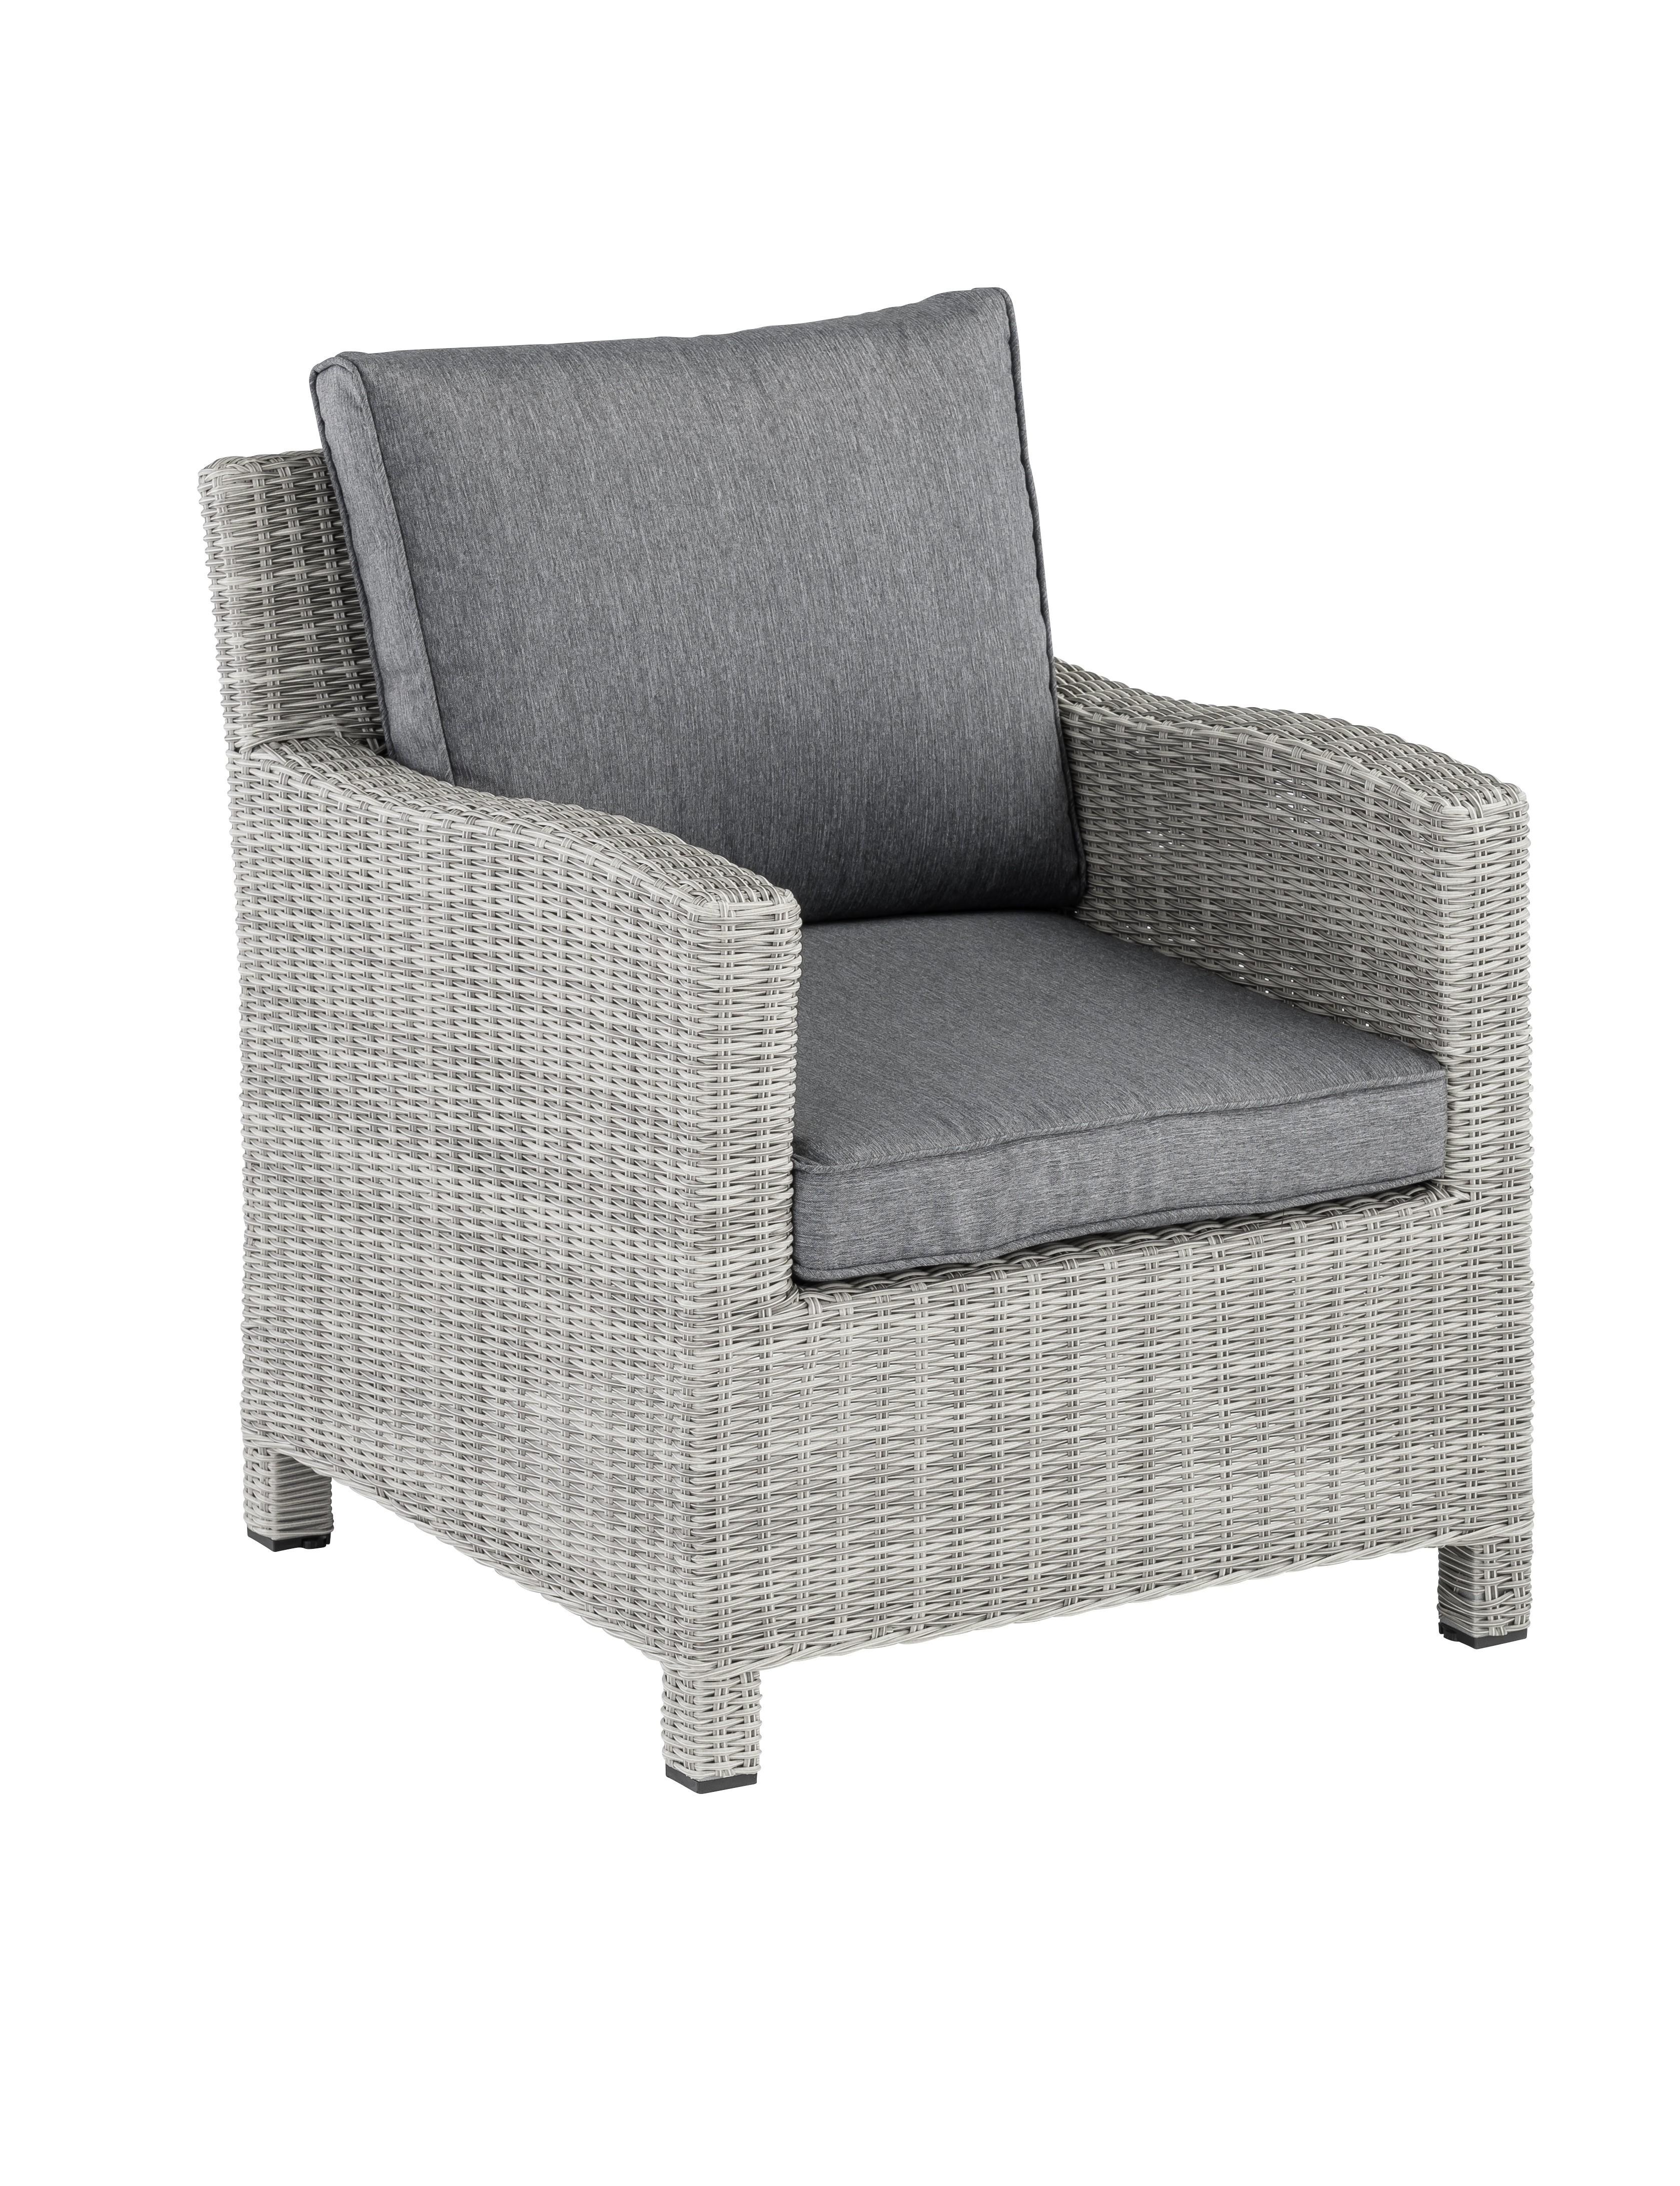 palma-fauteuil-white-wash-0103306-5500